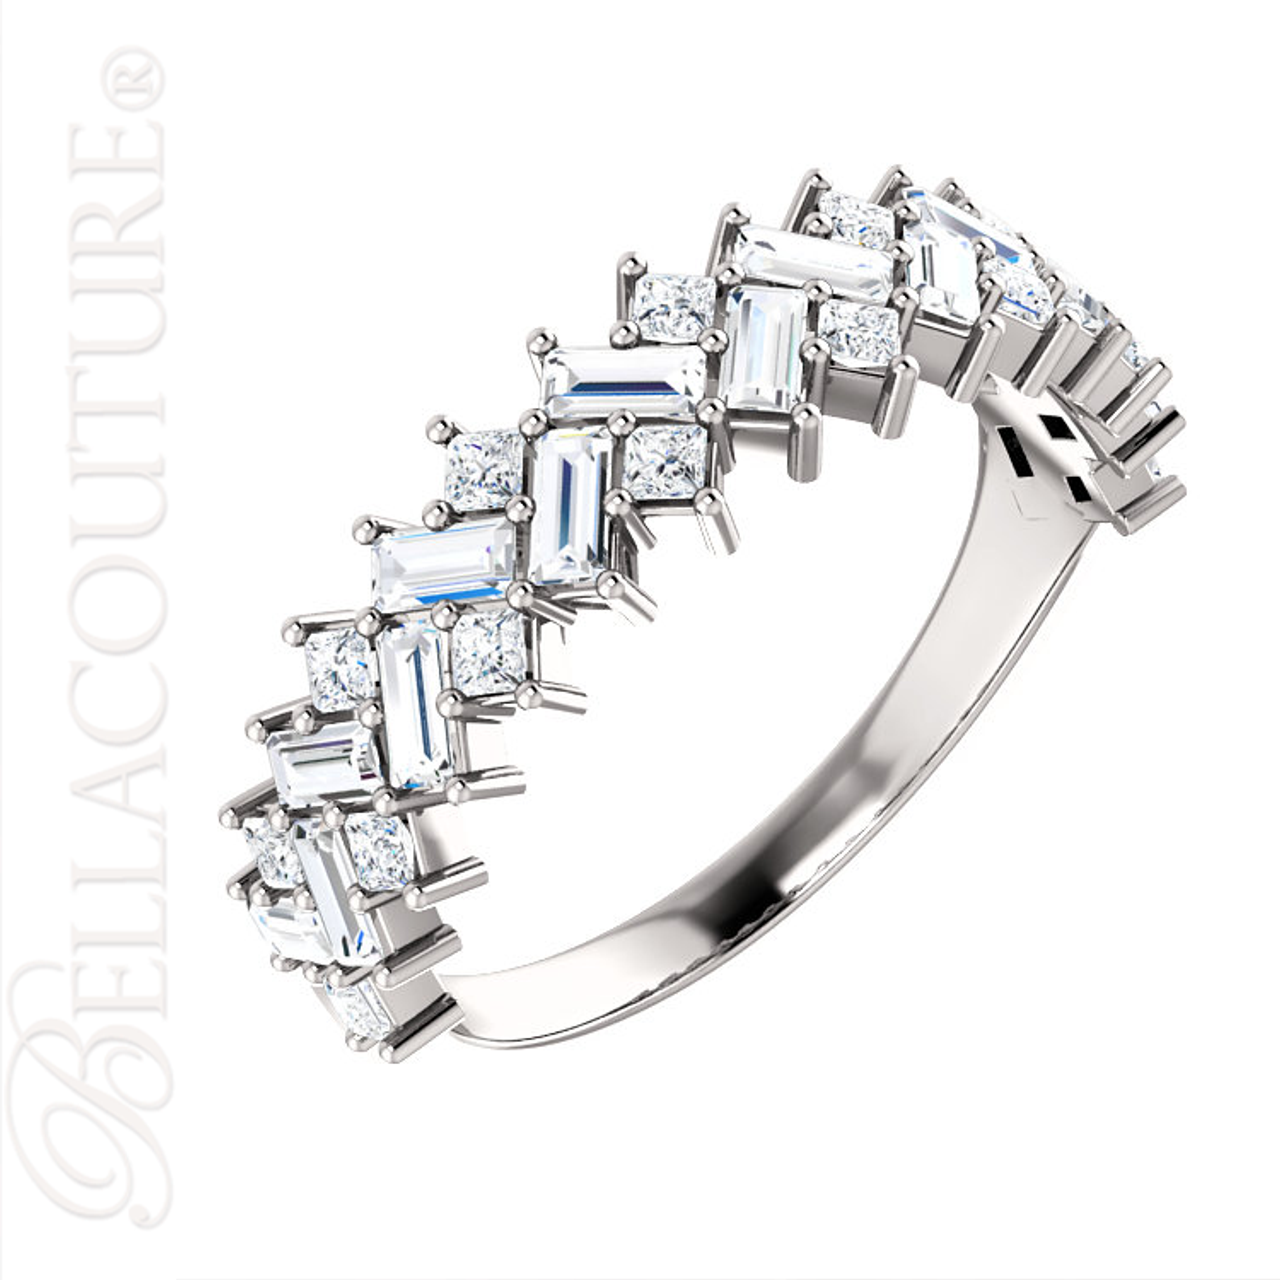 NEW) BELLA COUTURE ® BALISIMMA PLATINUM™ Baguette & Princess Cut 1CT ...